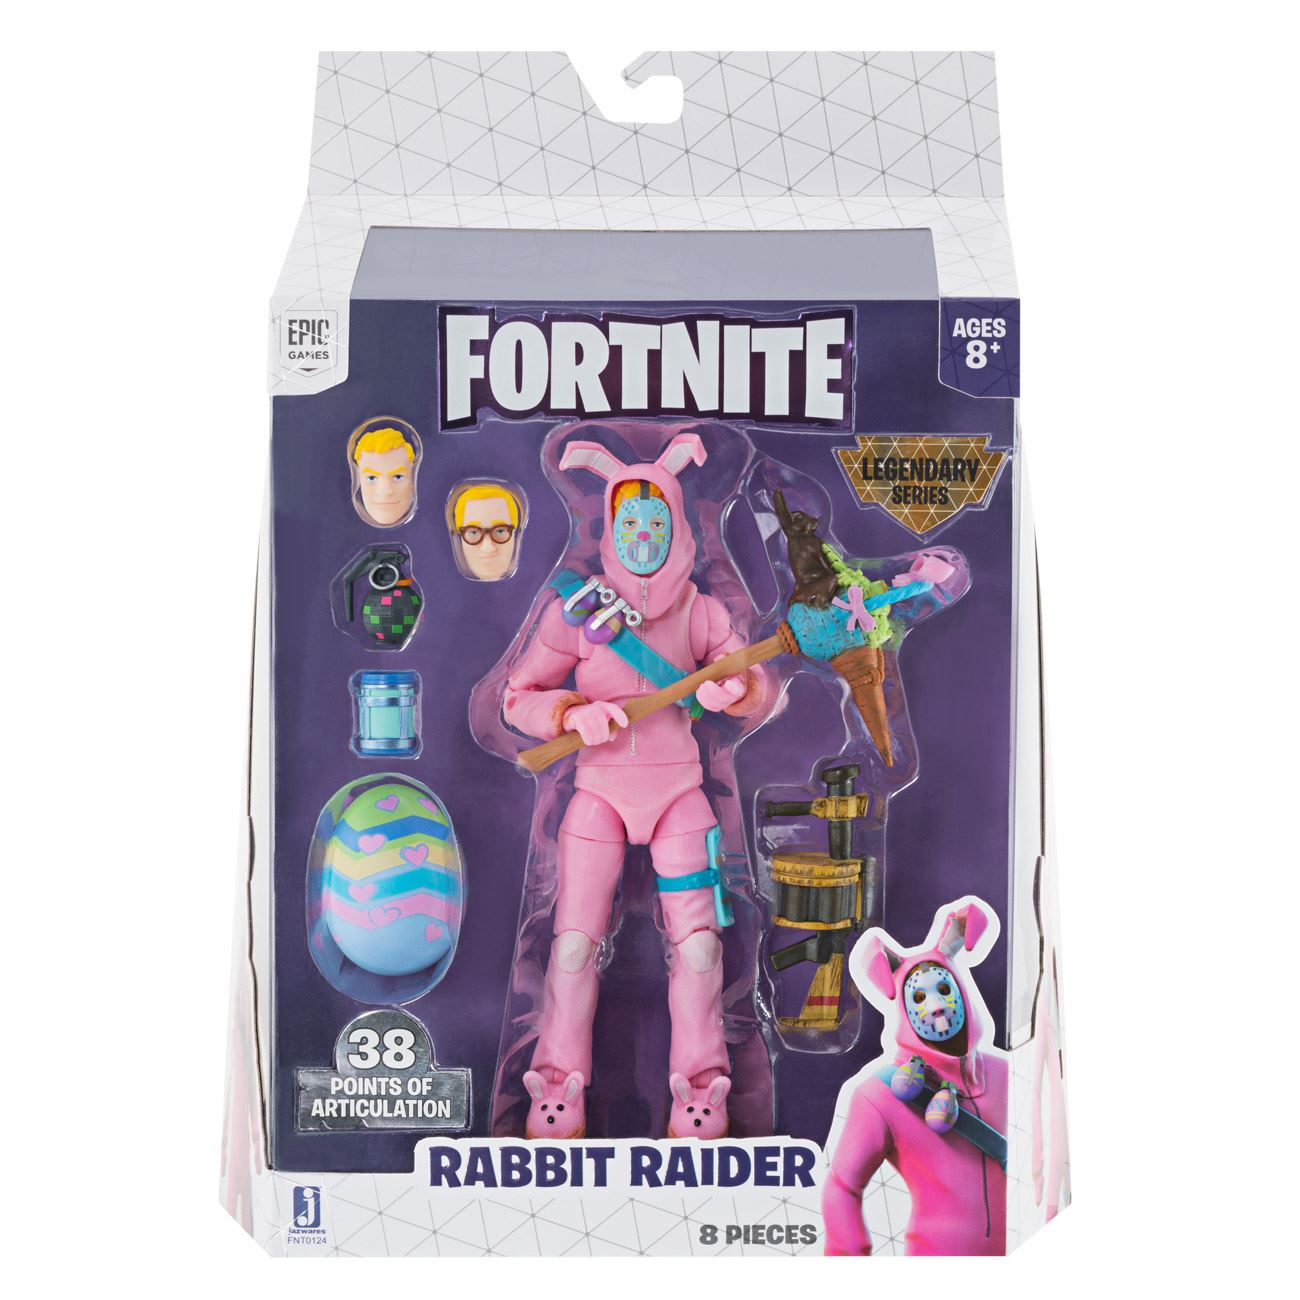 FORTNITE - RABBIT RAIDER - ACTION FIGURE - 15 CM